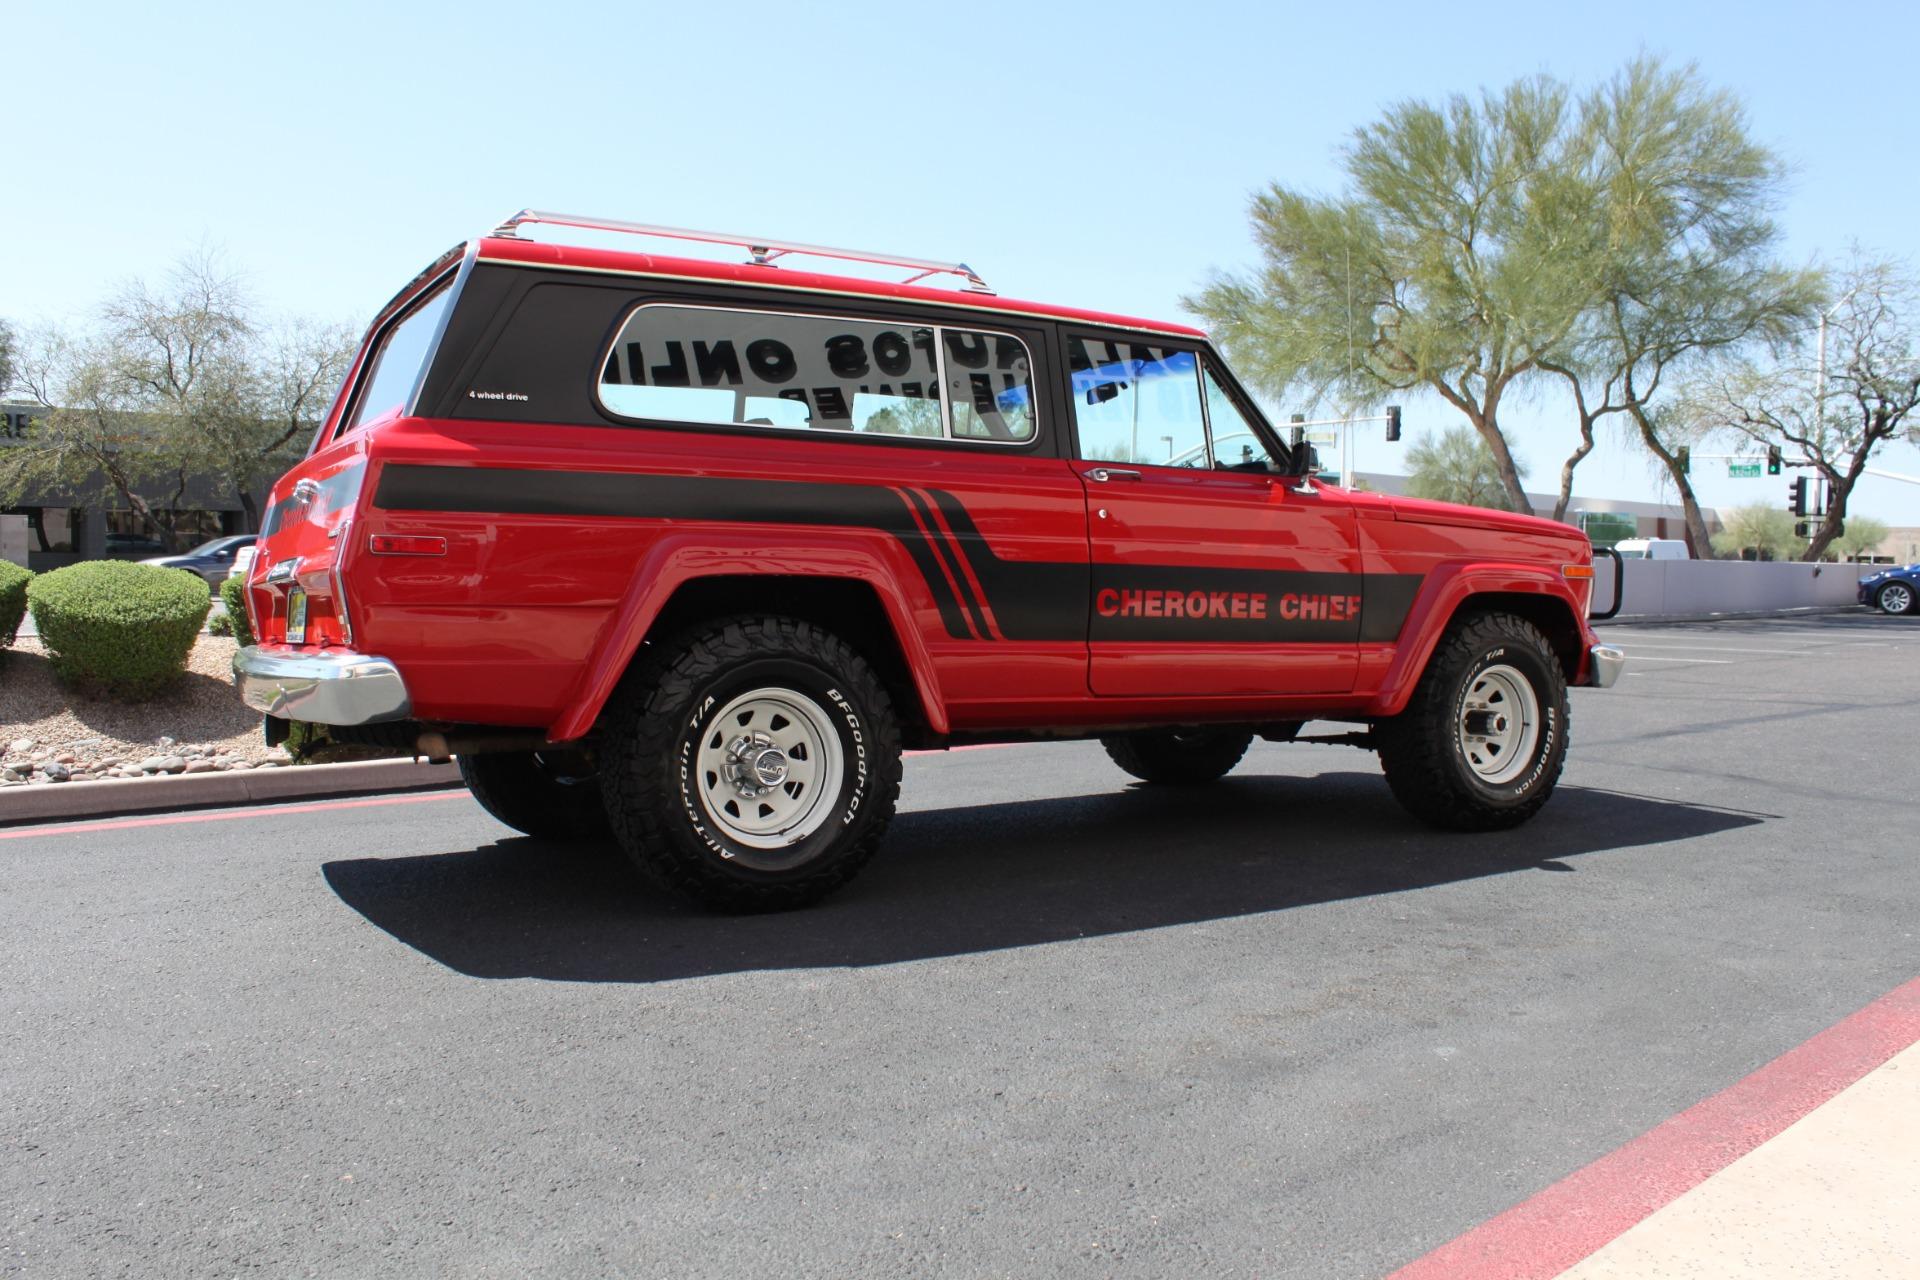 Used-1983-Jeep-Cherokee-Chief-4WD-Dodge